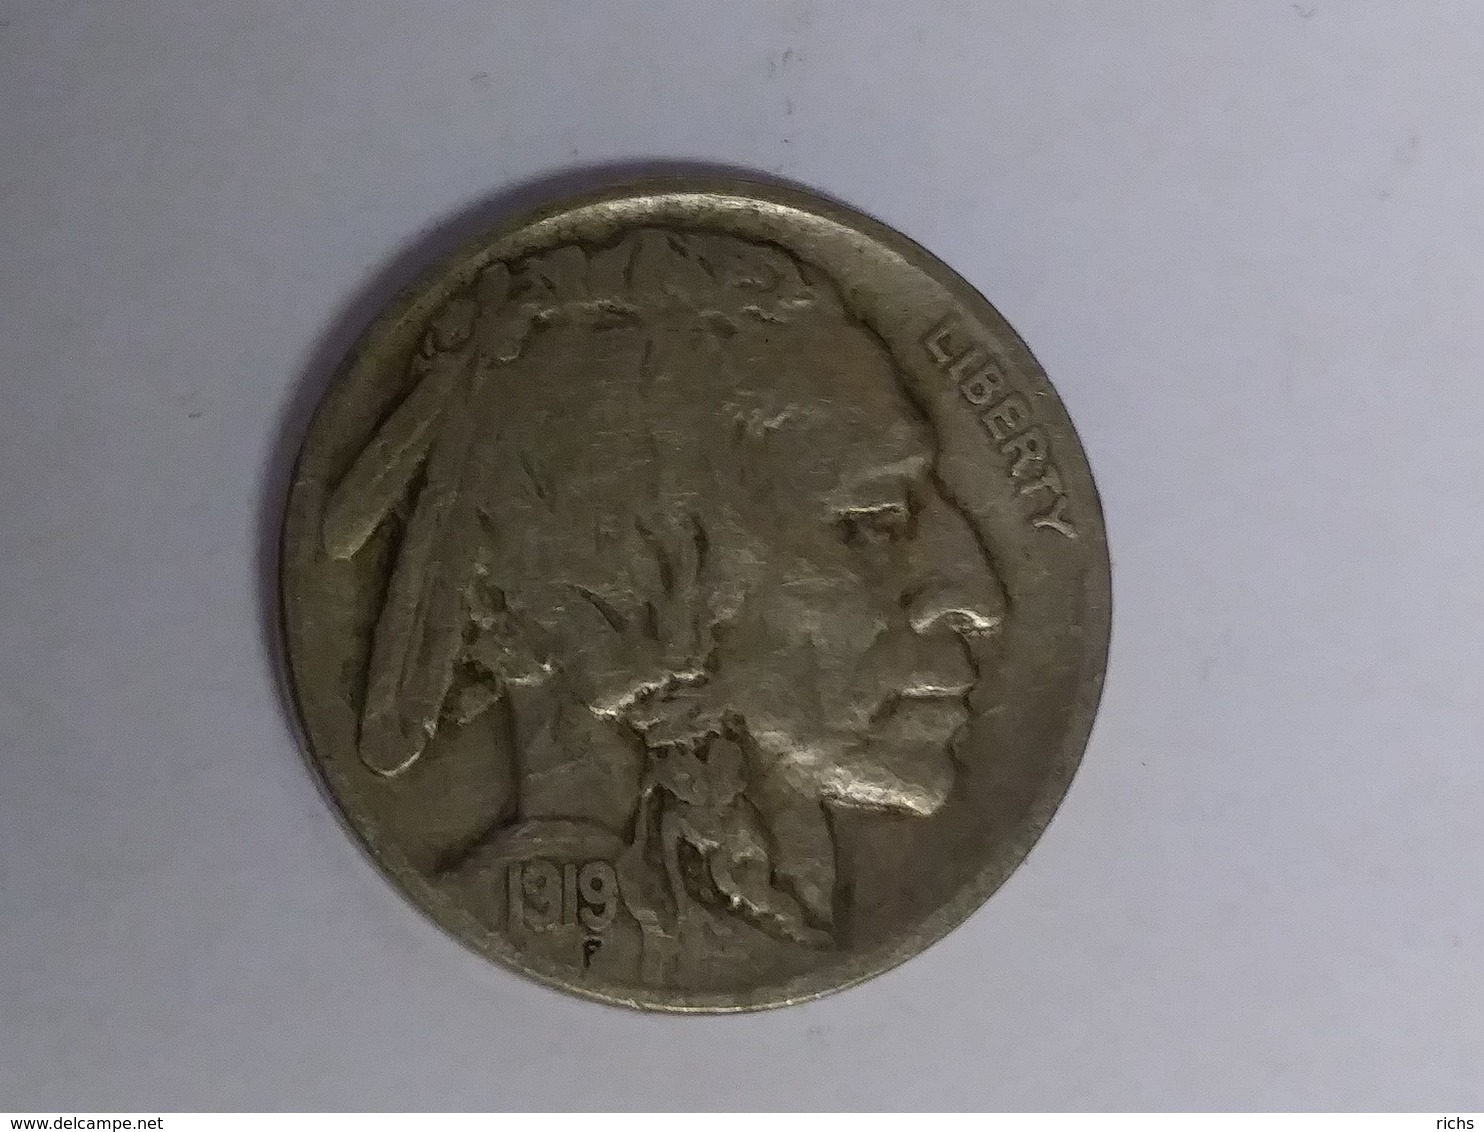 1919 Buffalo Nickel - 1913-1938: Buffalo